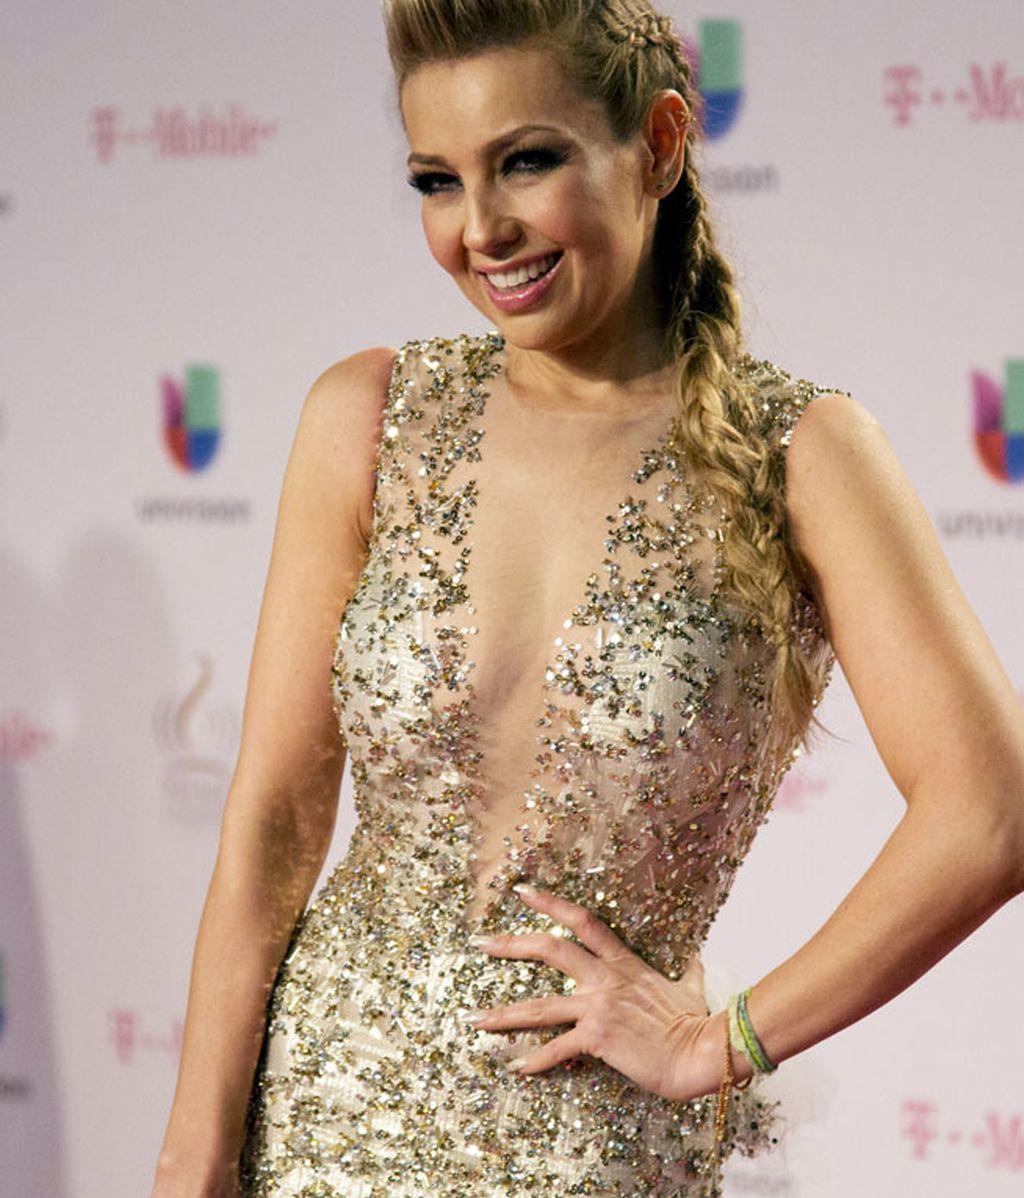 Thalia se suma a la sexy tendencia del 'braless' con este vestido champán